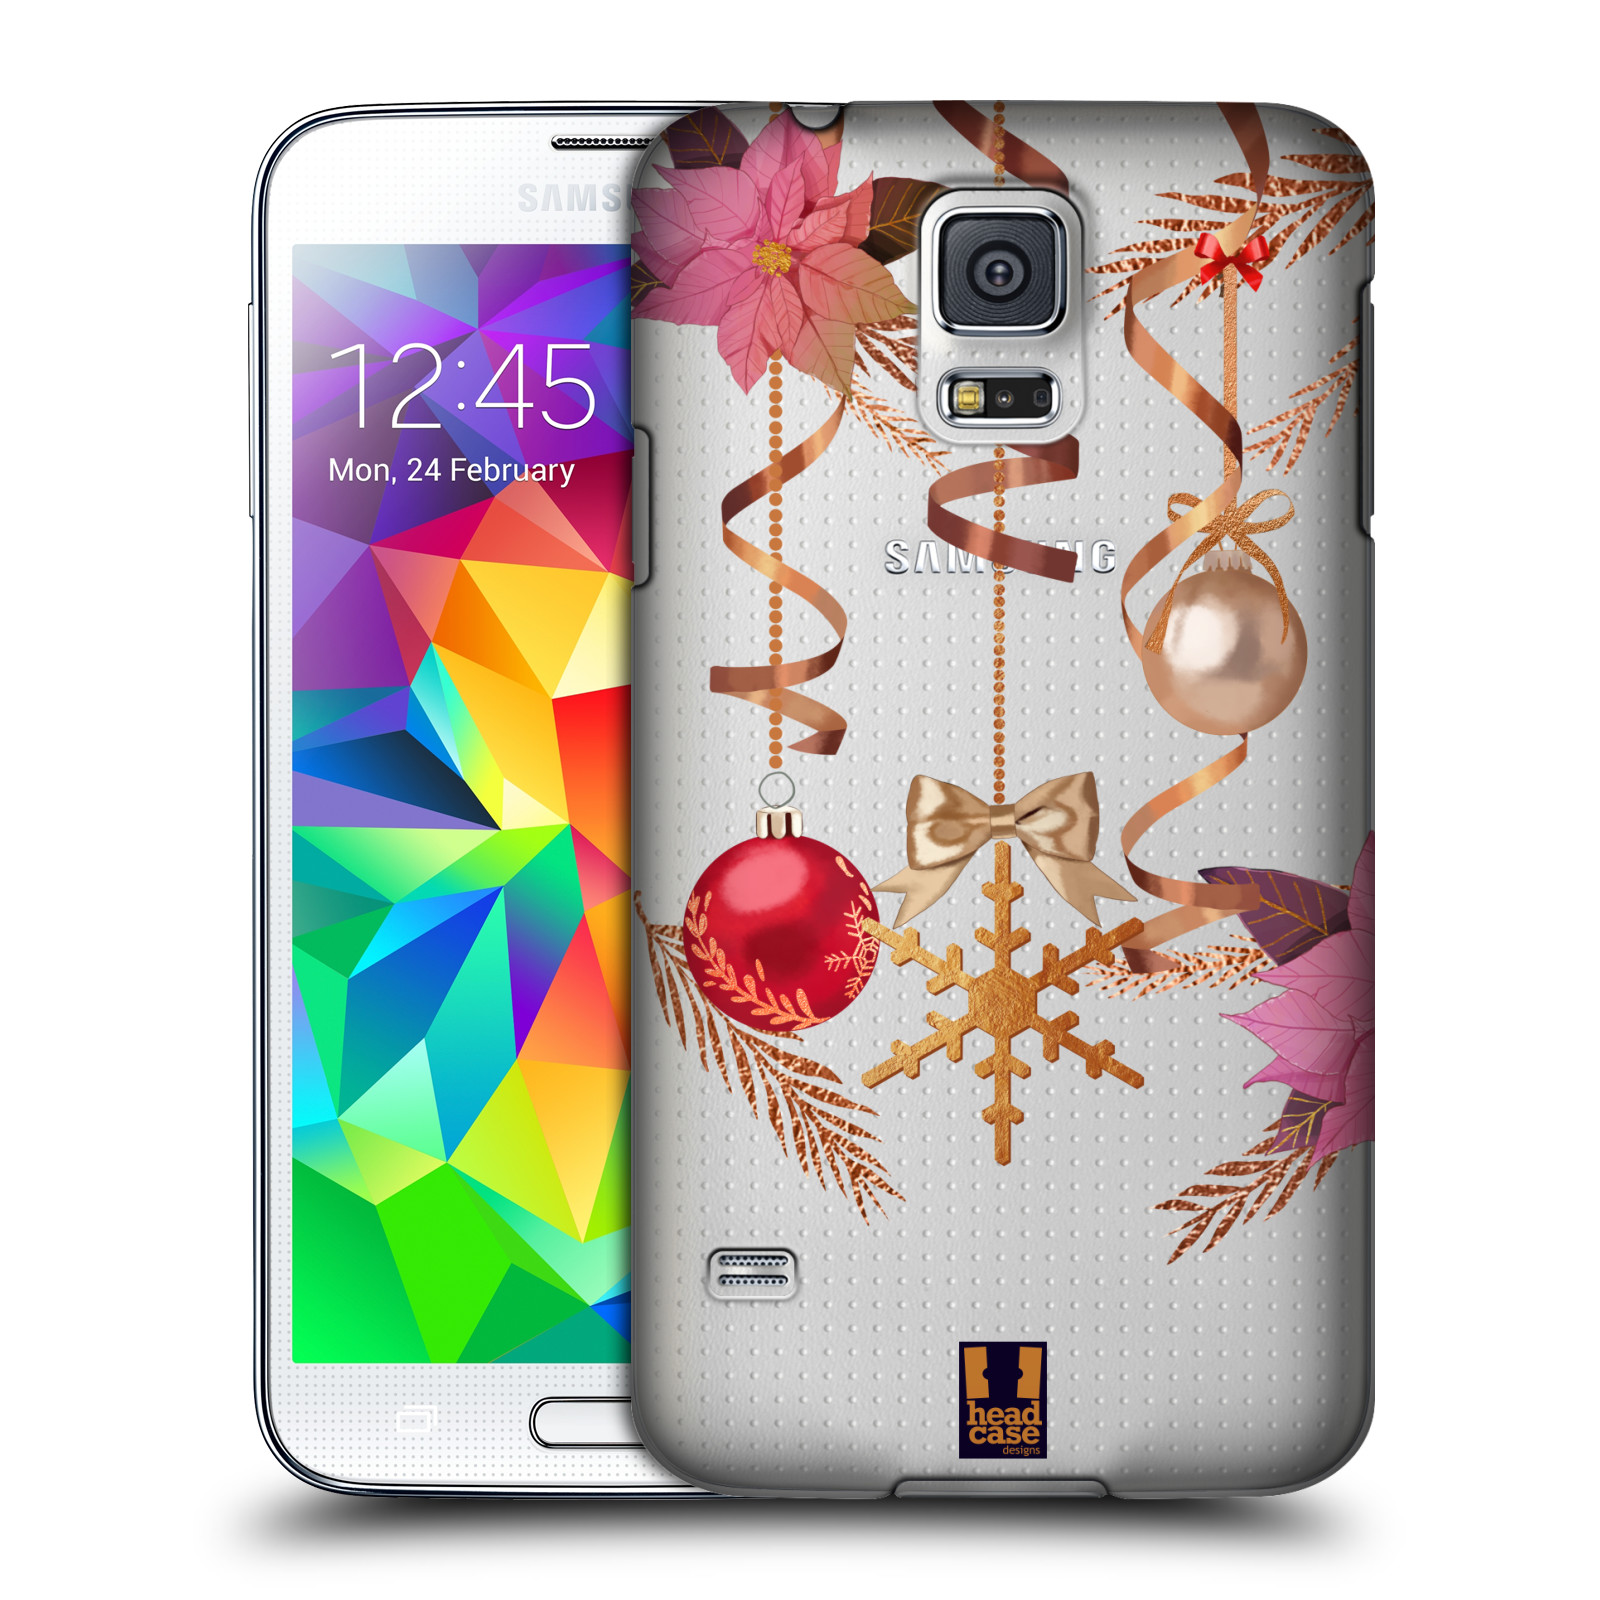 Plastové pouzdro na mobil Samsung Galaxy S5 - Head Case - Vločka a vánoční ozdoby